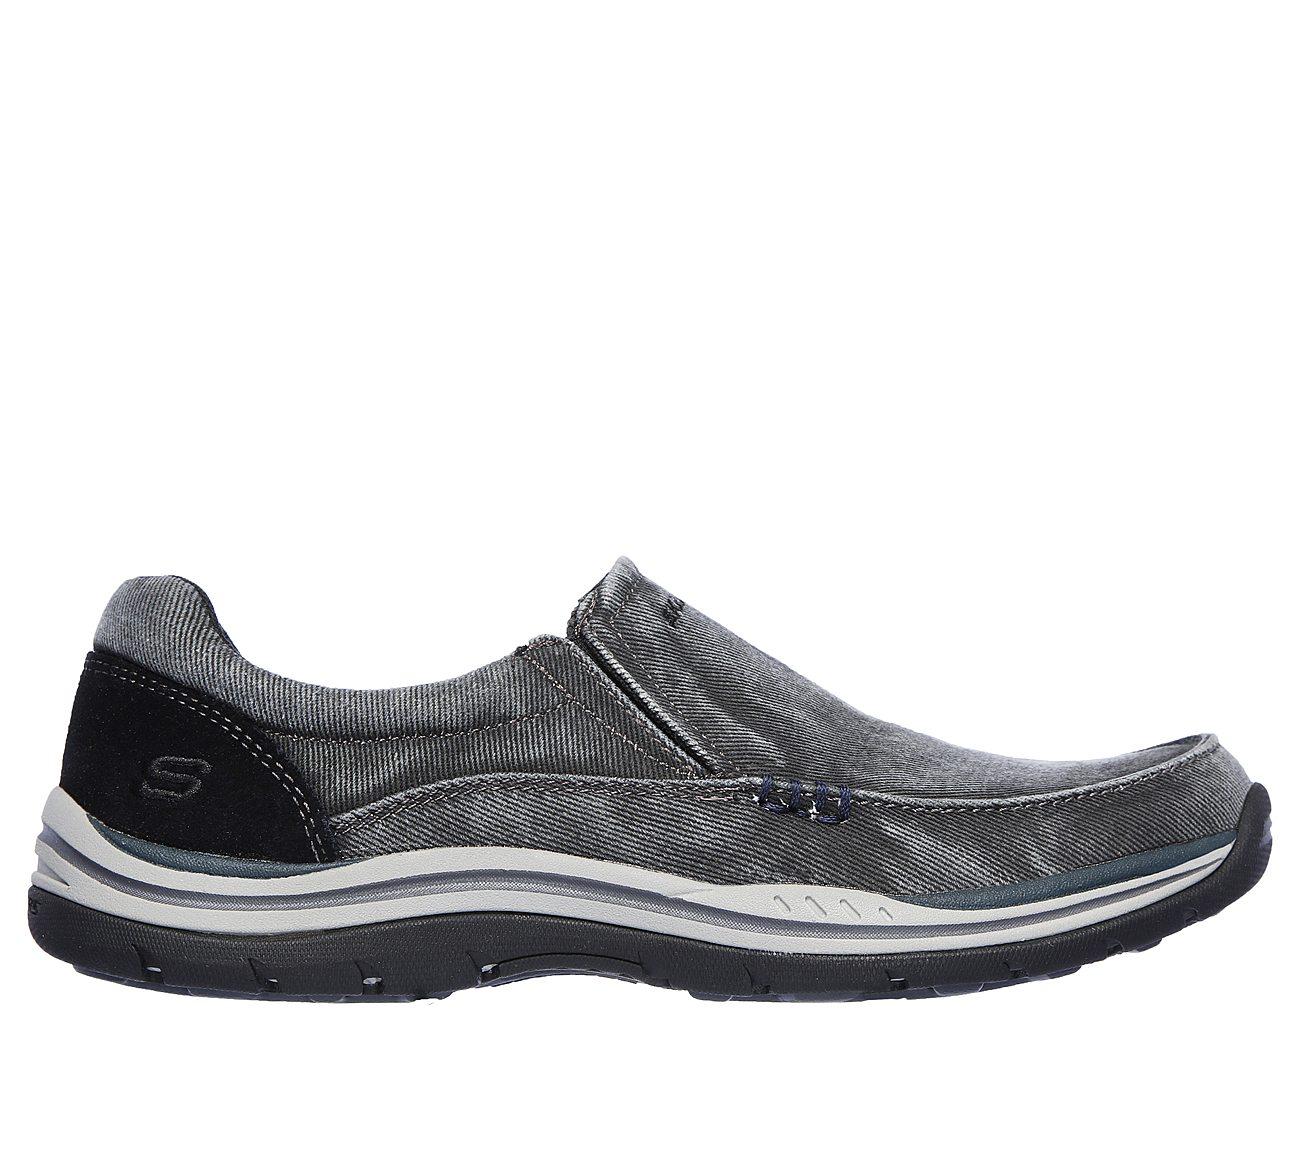 Skechers Shoes  Skechers Avillo 64109 Mens Casual Shoes Black